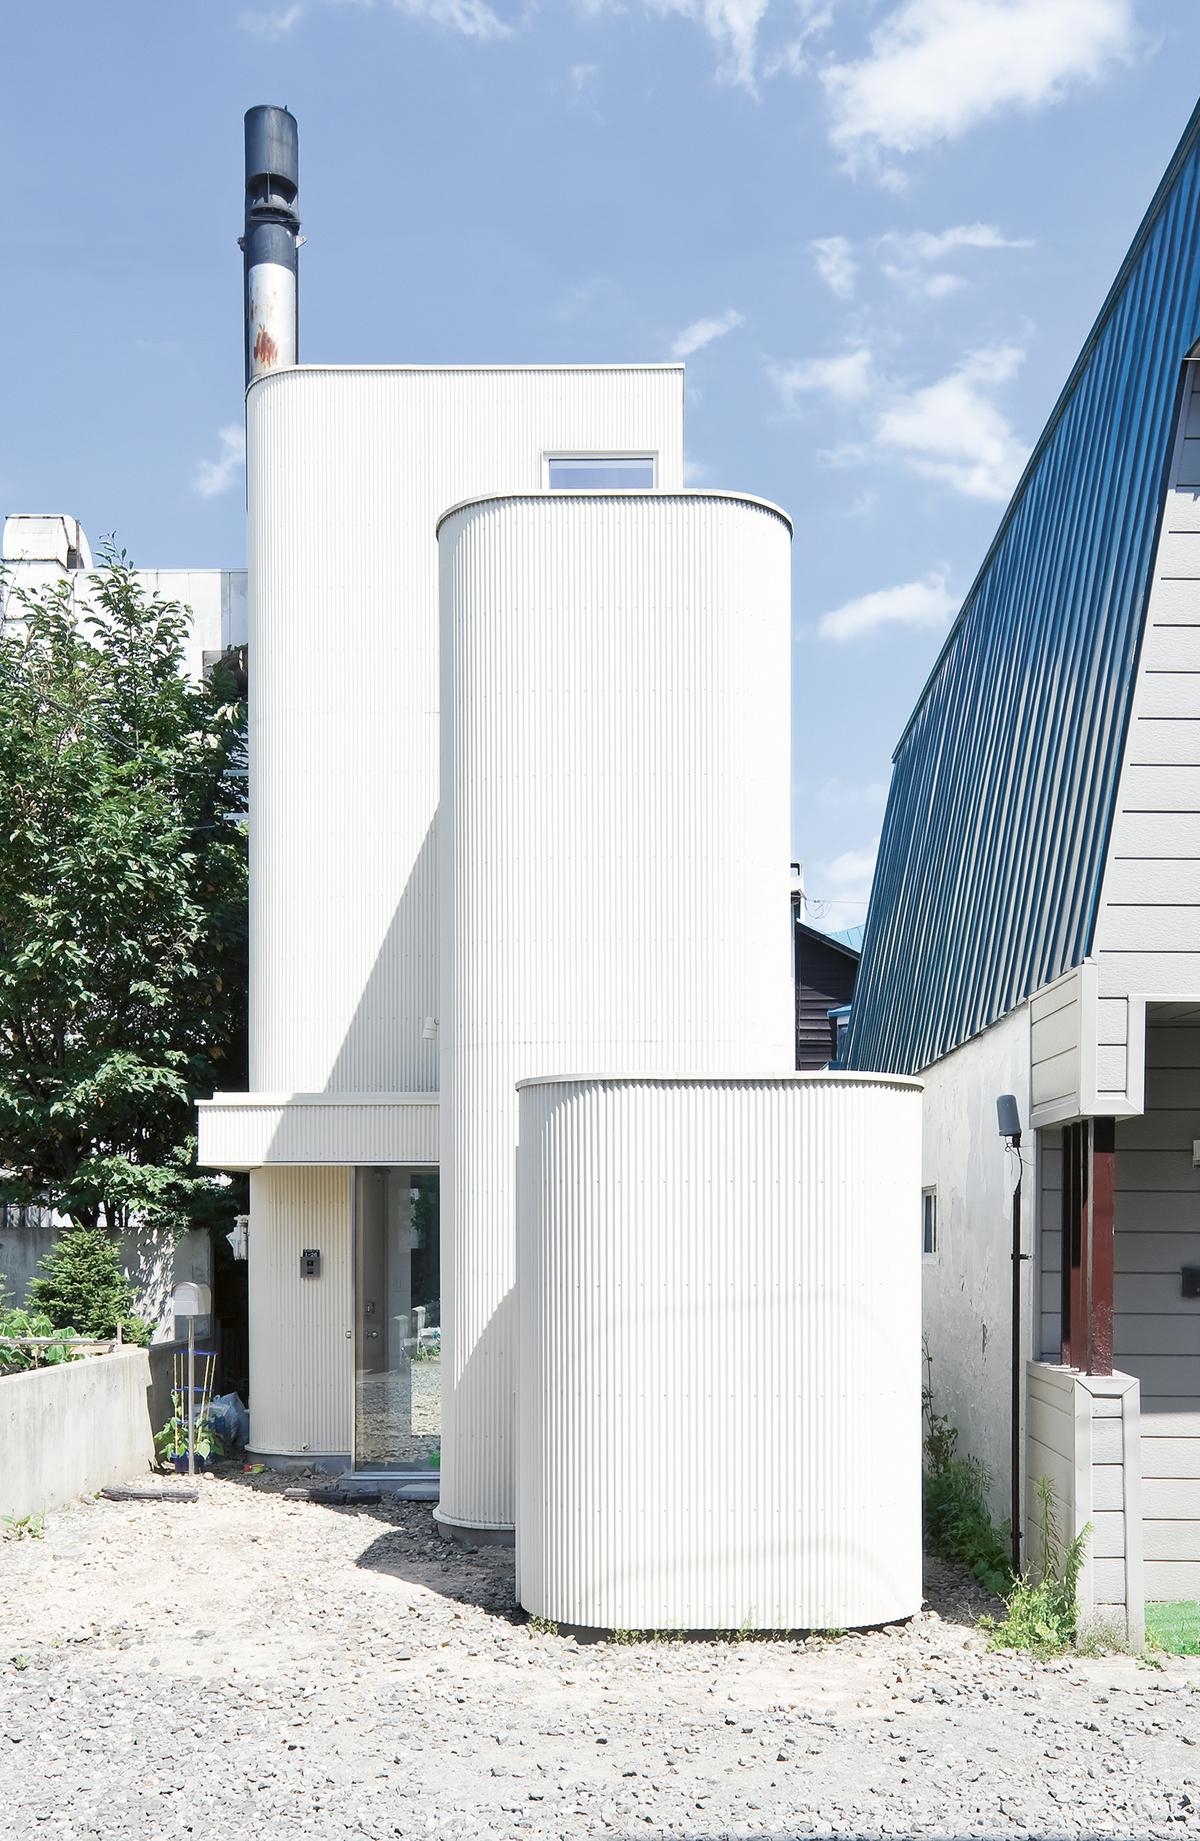 House of Density, Jun Igarashi, 2013, Sapporo, Hokkaido Prefecture.Photo: Sergio Pirrone